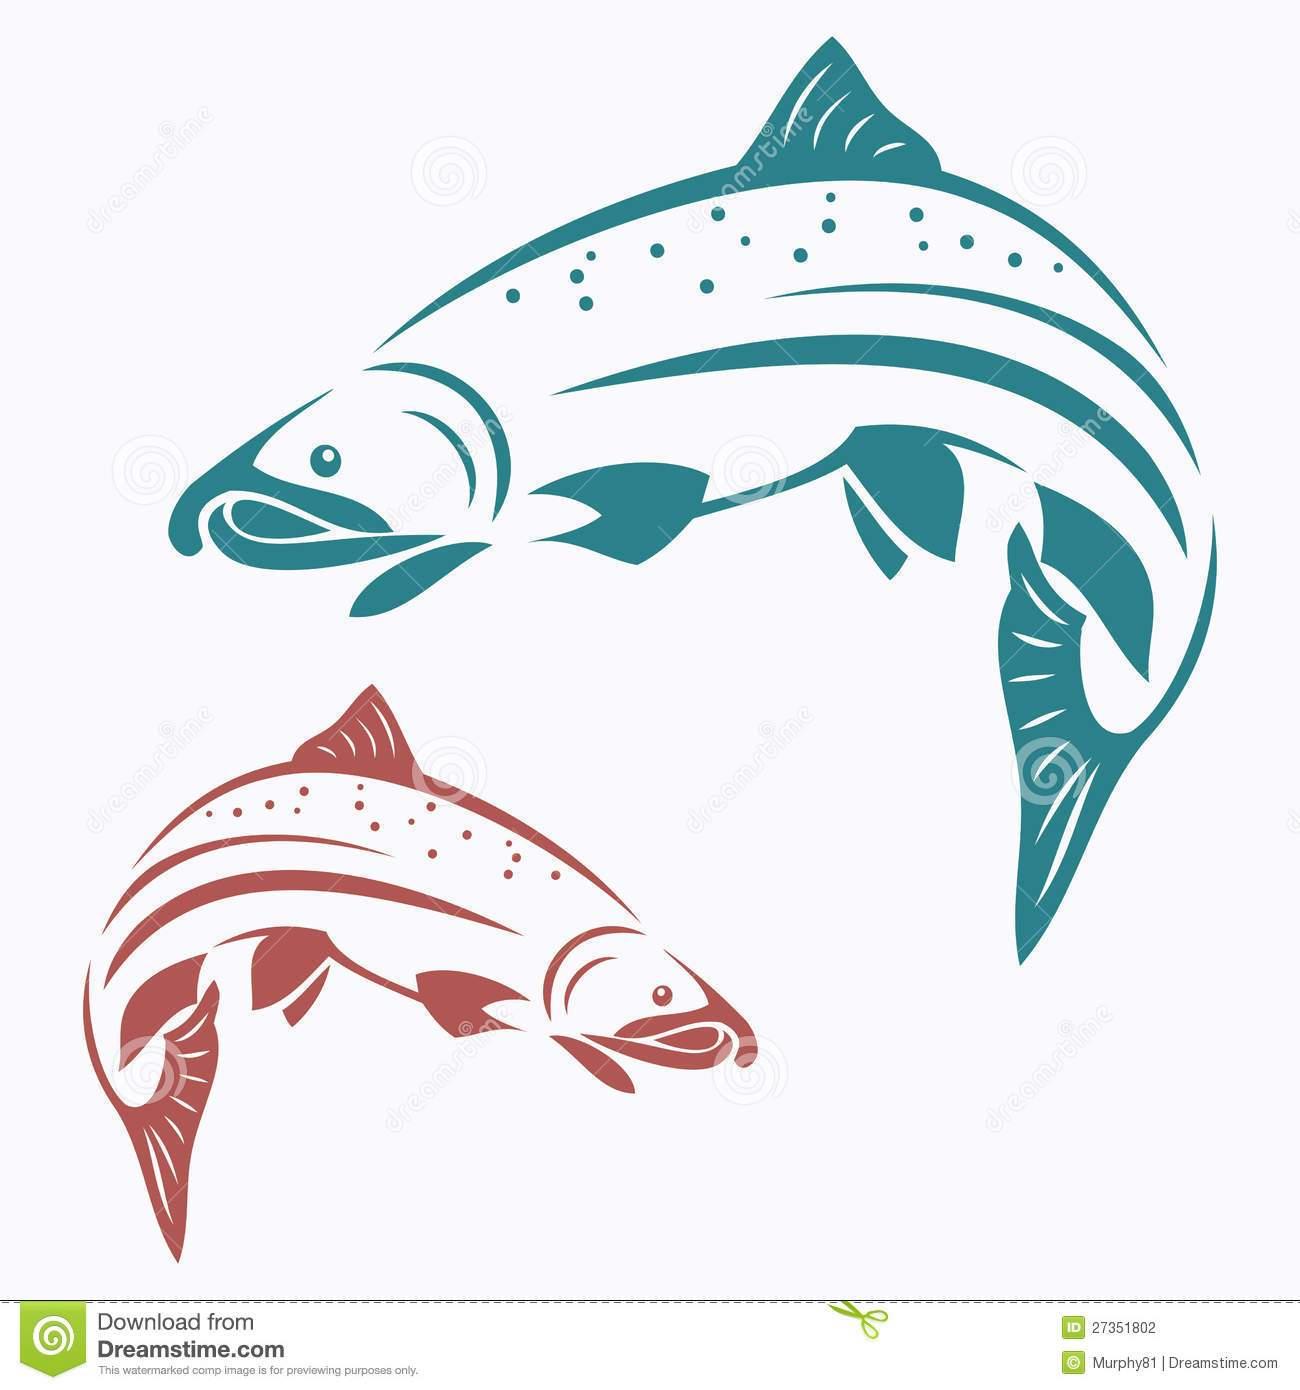 Jumping salmon clipart vector transparent stock Salmon jumping clipart 6 » Clipart Portal vector transparent stock